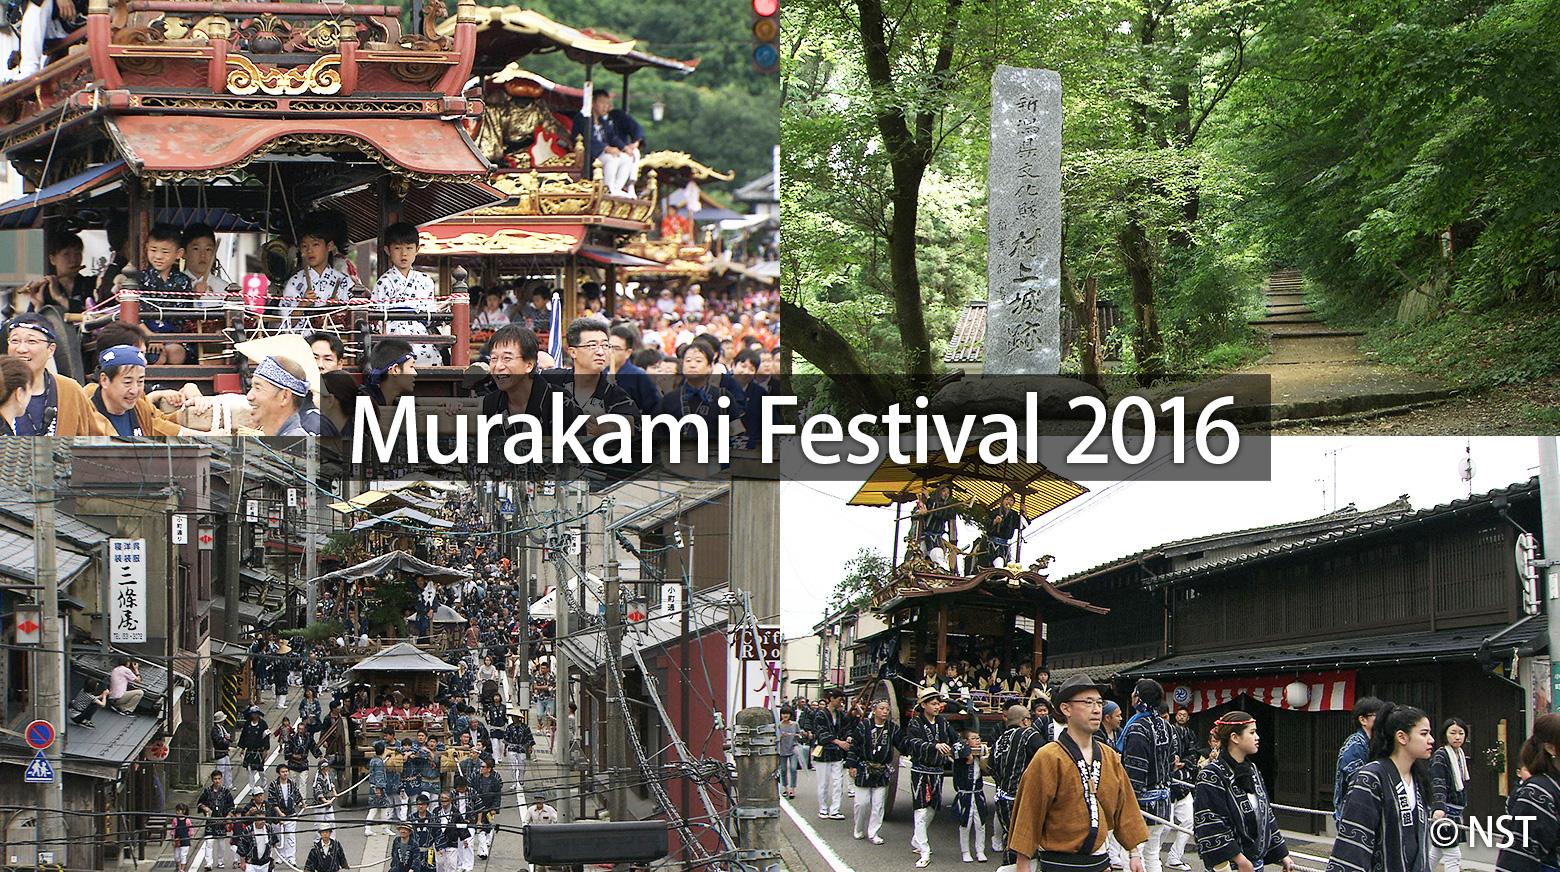 Murakami Grand Festival 2016: Tradition Passed Down